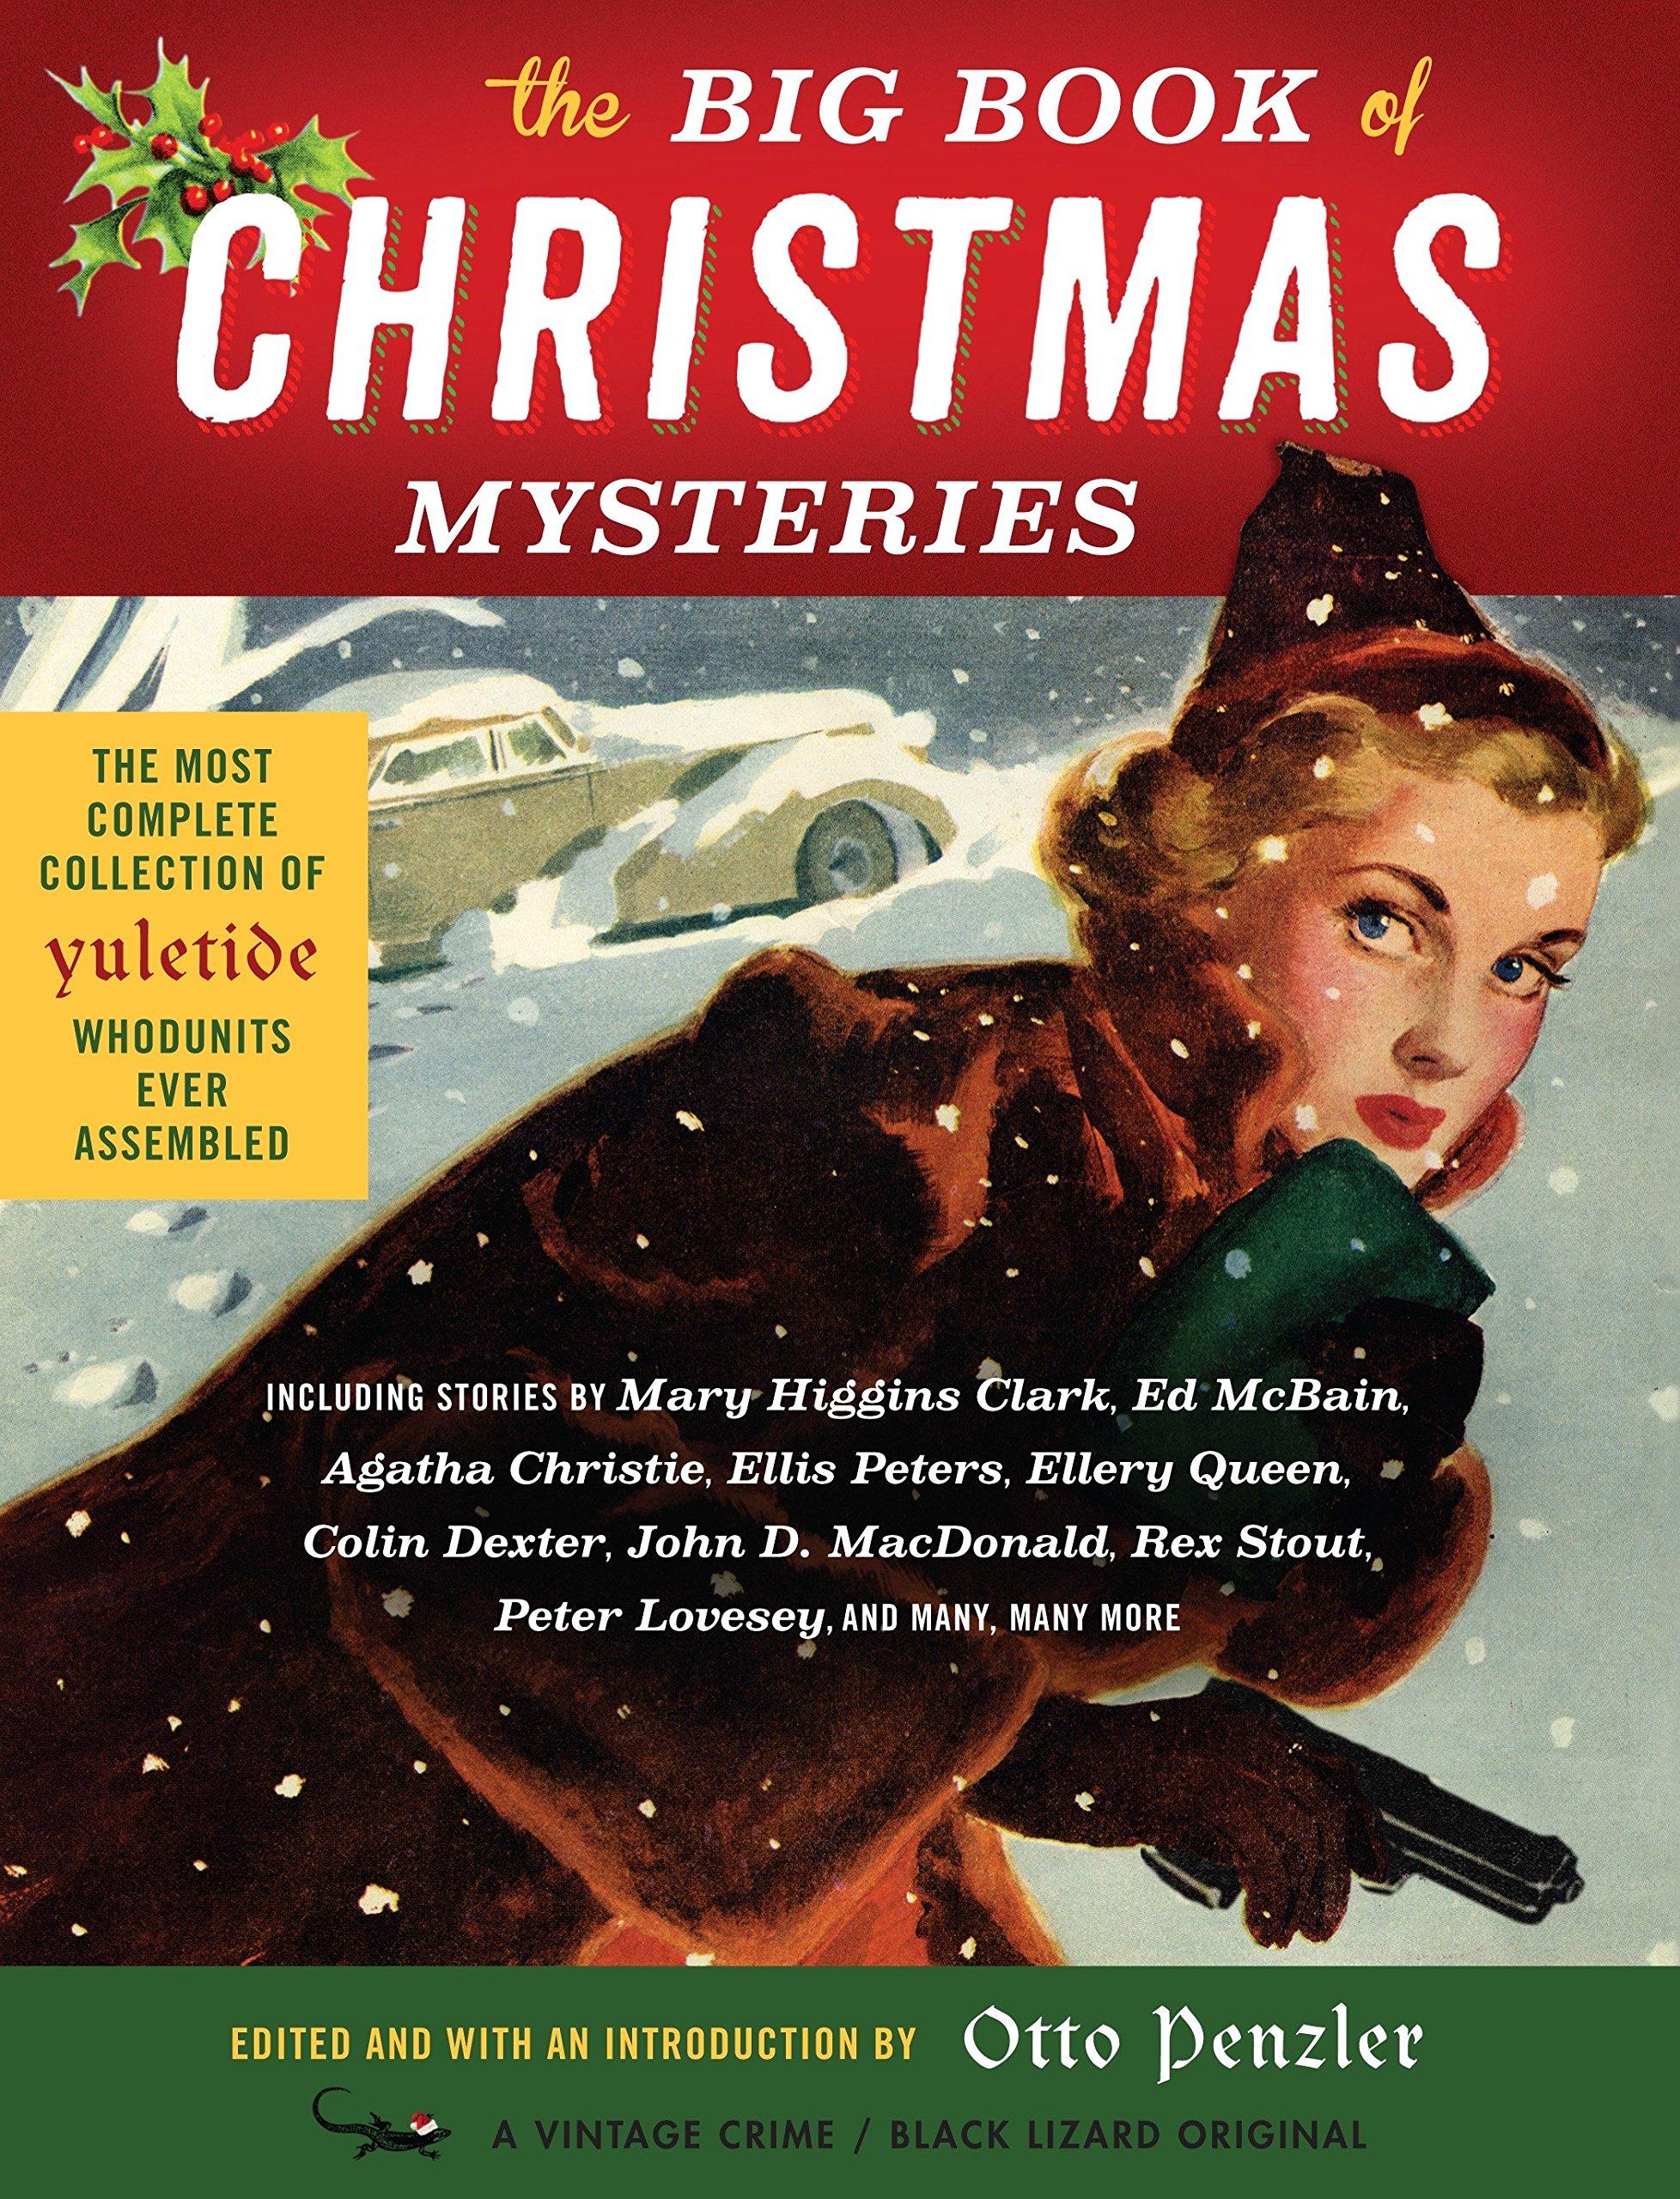 The Big Book of Christmas Mysteries (Vintage Crime/Black Lizard): Penzler, Otto: 9780345802989: Amazon.com: Books